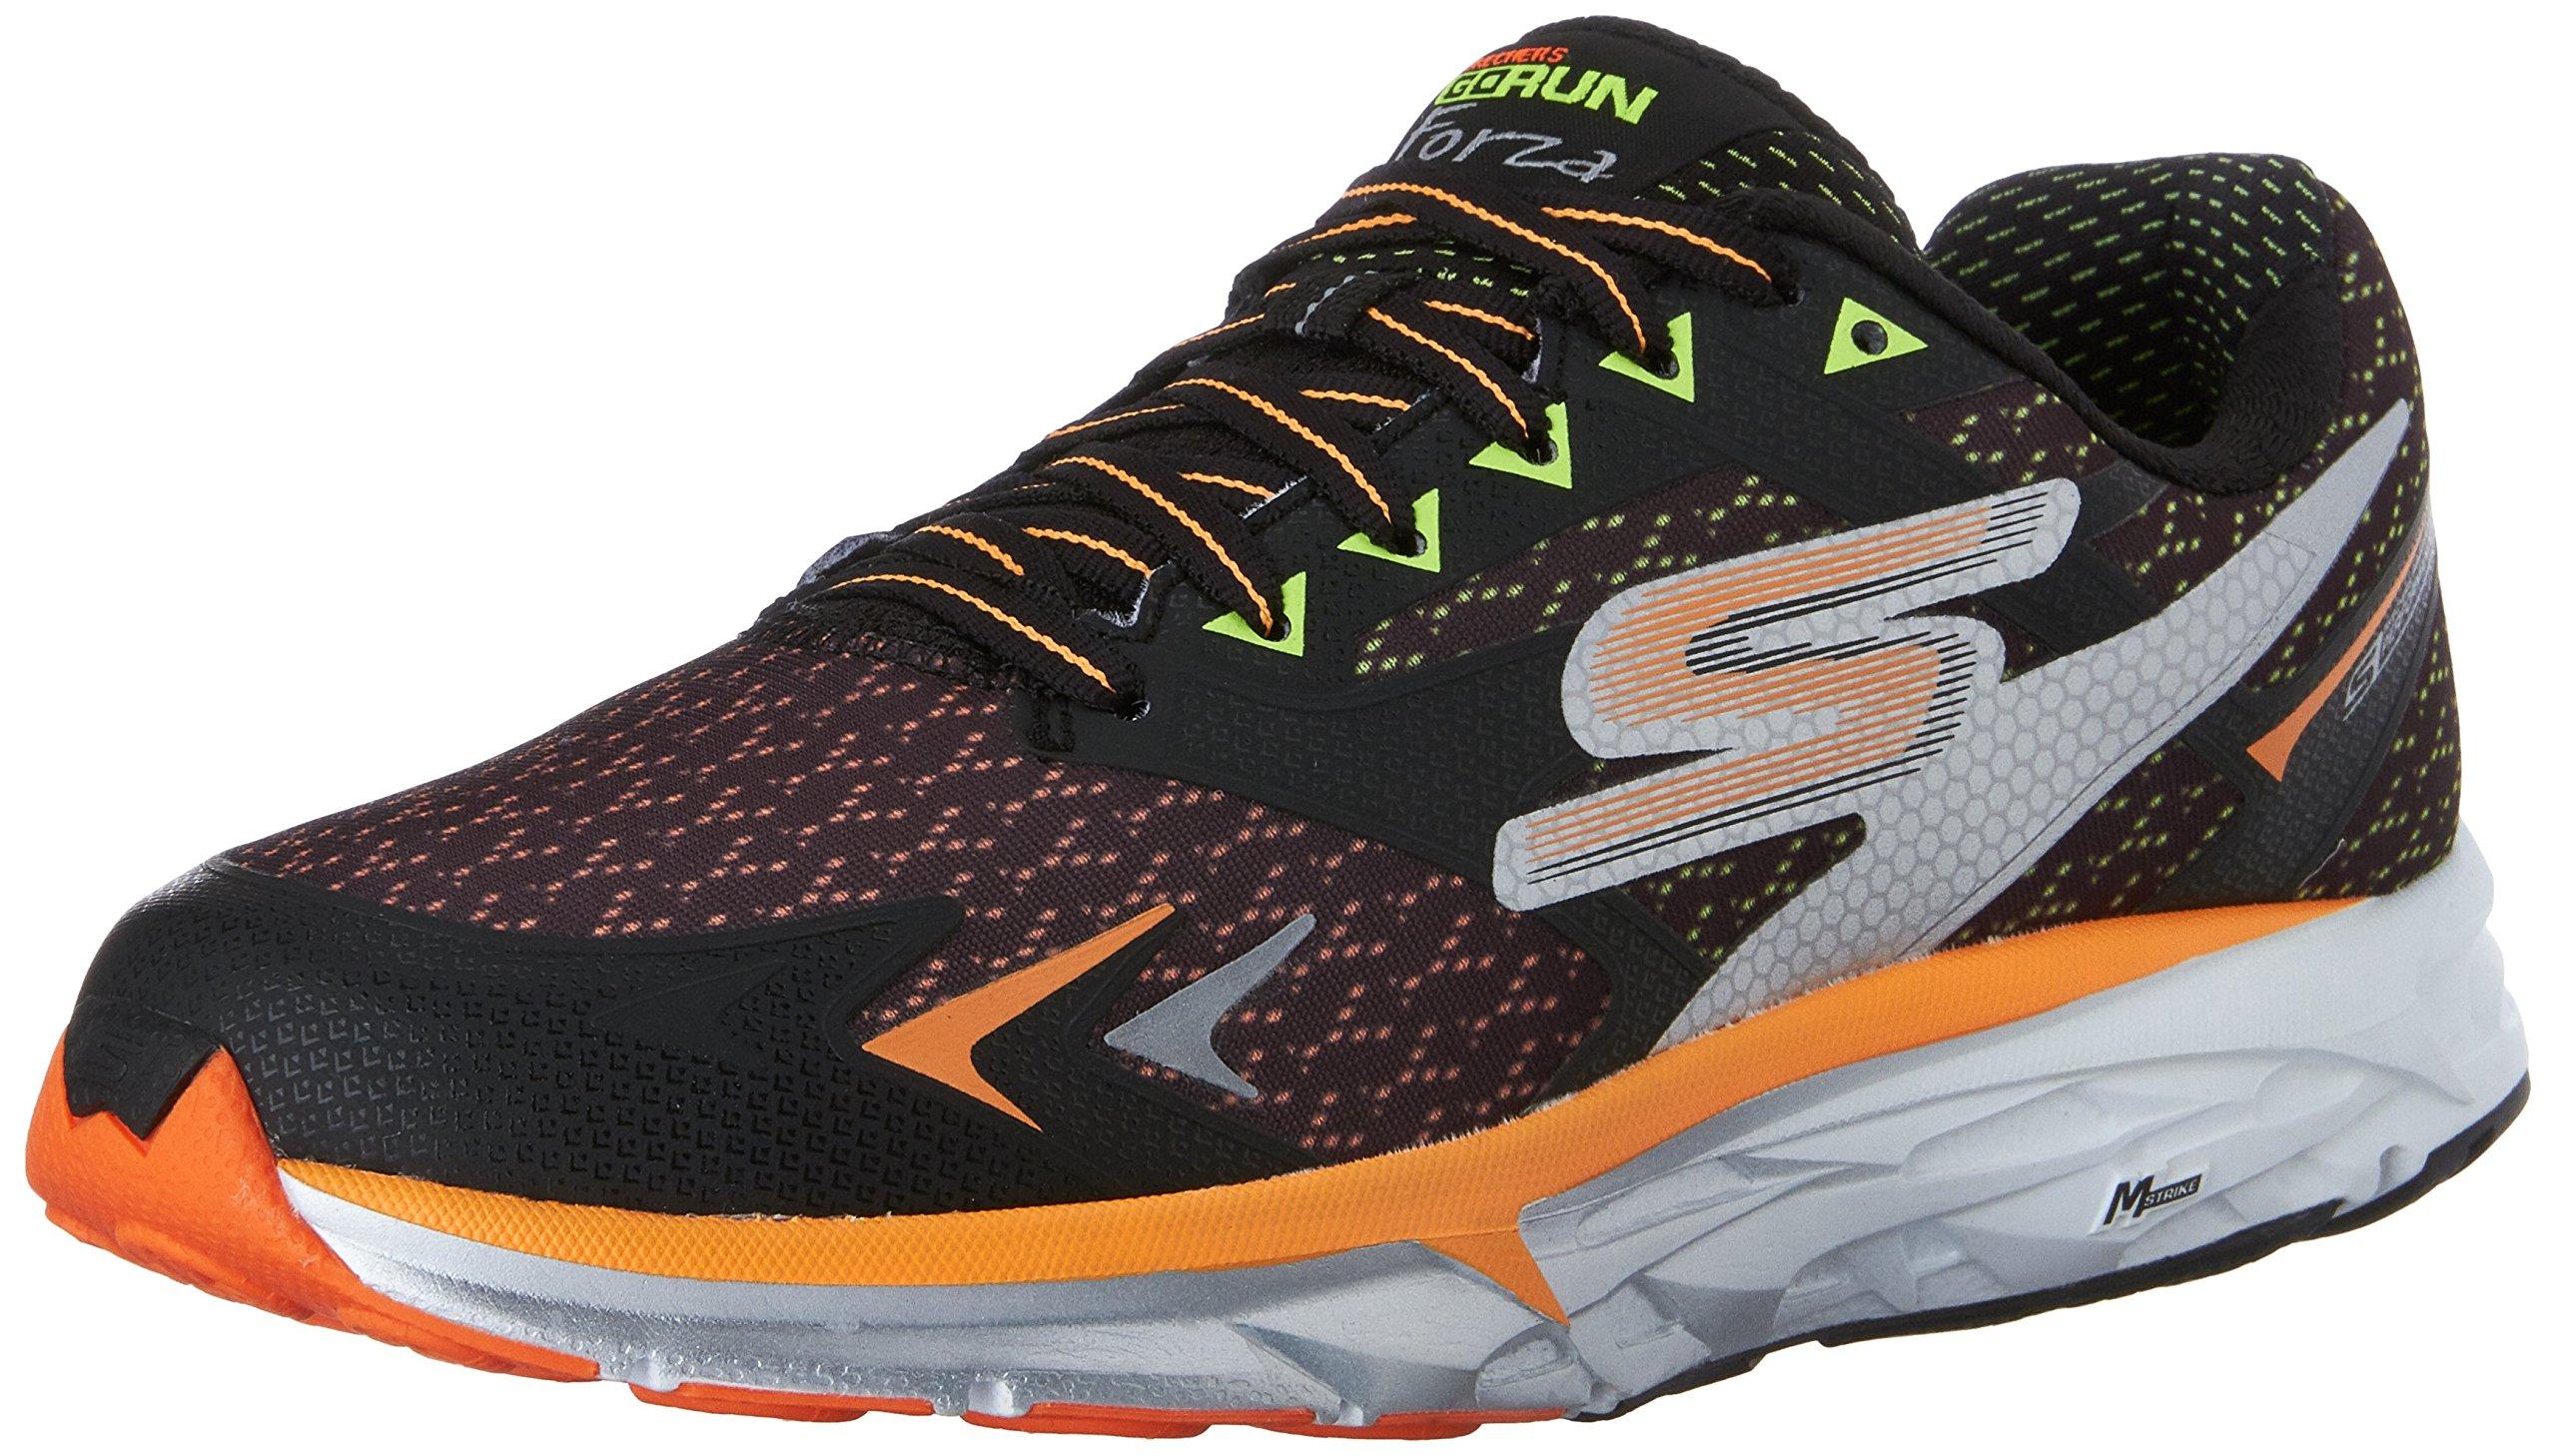 91IvBIr3k8L - Skechers Men's Go Forza Running Shoes